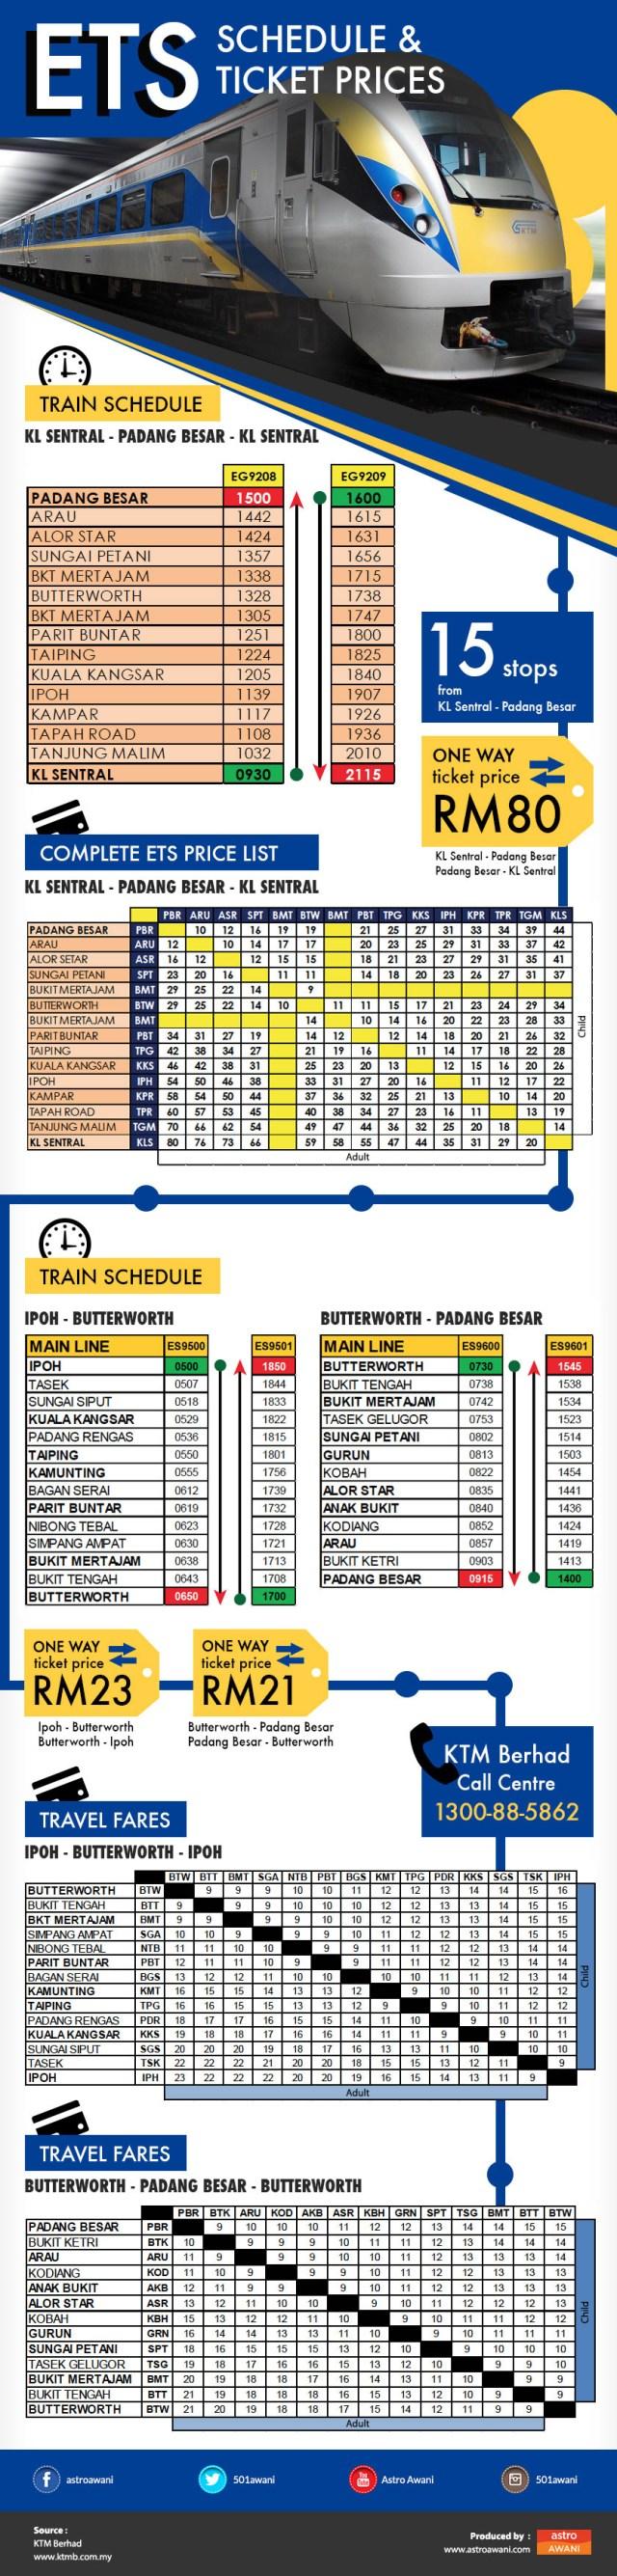 ETS-schedule-train-fare